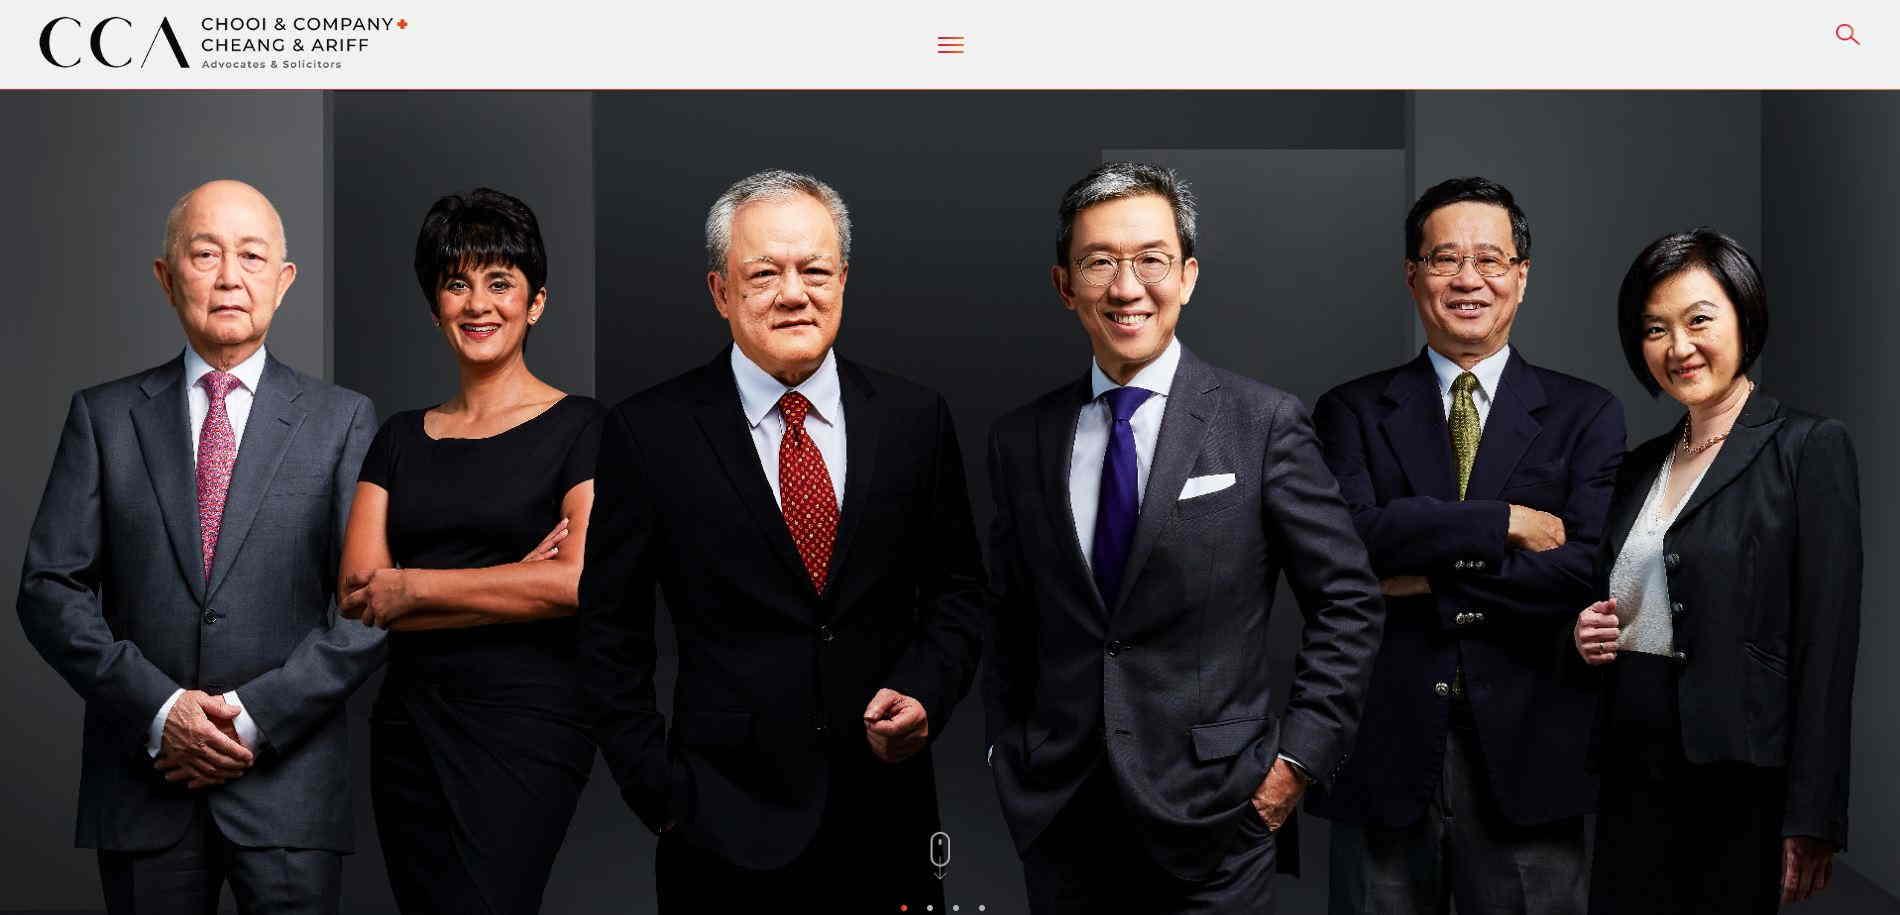 web design for lawyers_chooi